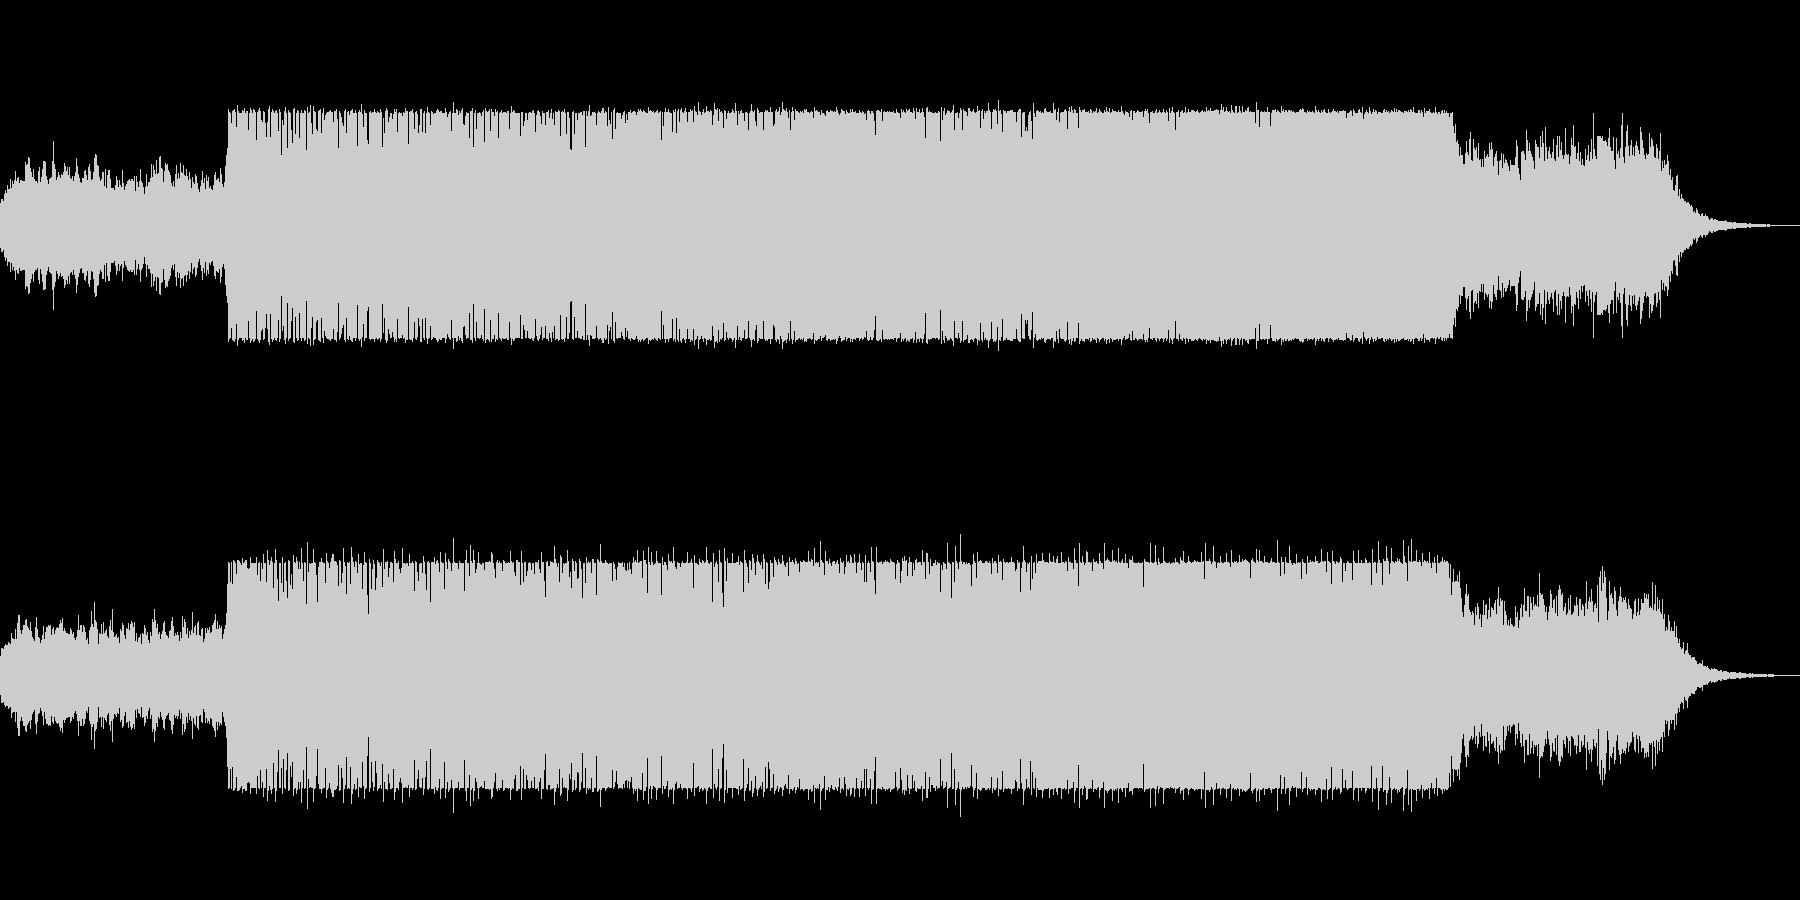 bpm98の壮大で重厚感のあるテクノの未再生の波形